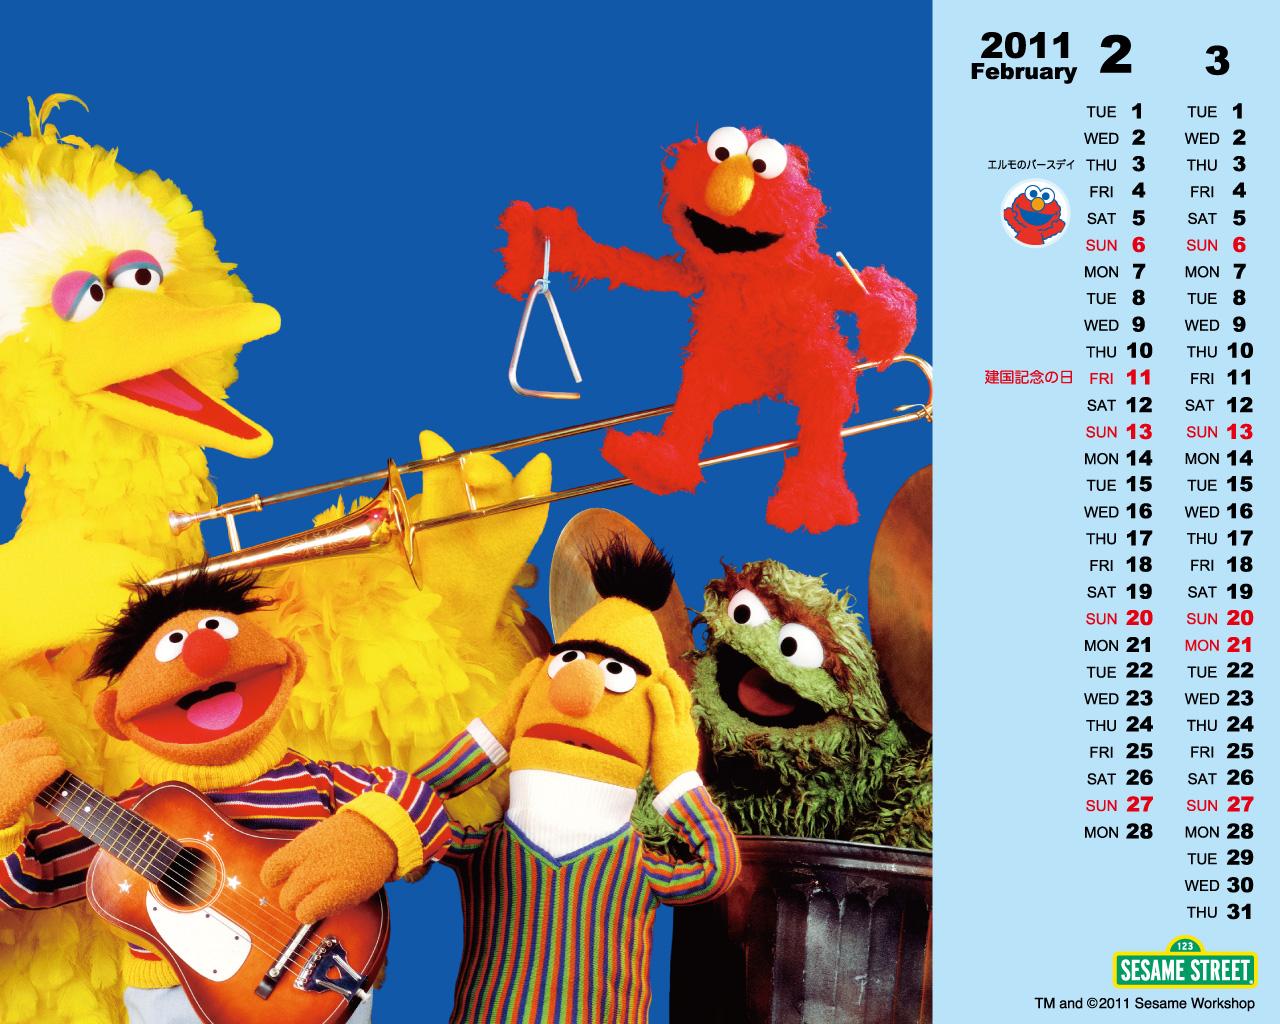 Free Download Wallpaper 1280x1024 For Your Desktop Mobile Tablet Explore 49 Sesame Street Fun Wallpaper Elmo Wallpaper Sesame Street Wallpaper Border